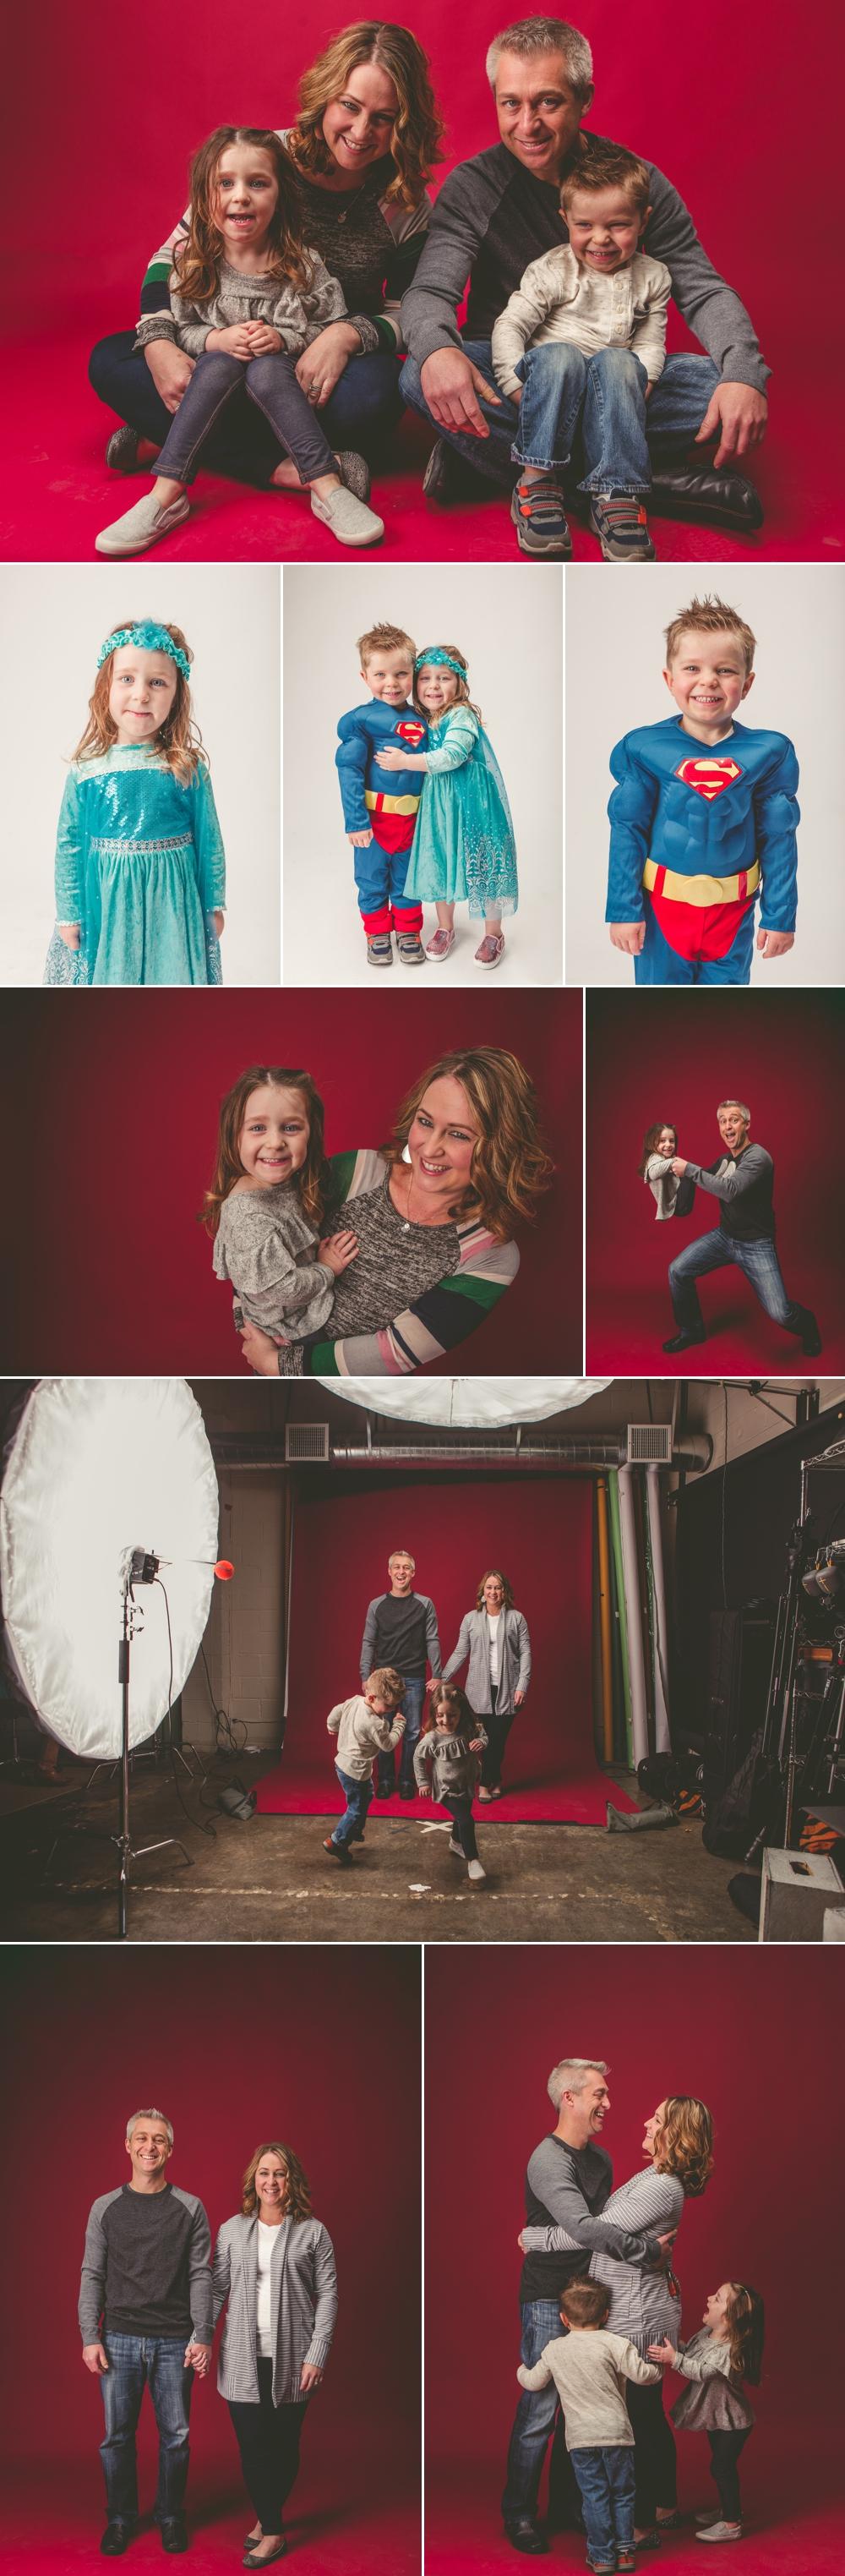 jason_domingues_photography_best_kansas_city_photographer_family_photos_modern_studio_session_0002.JPG